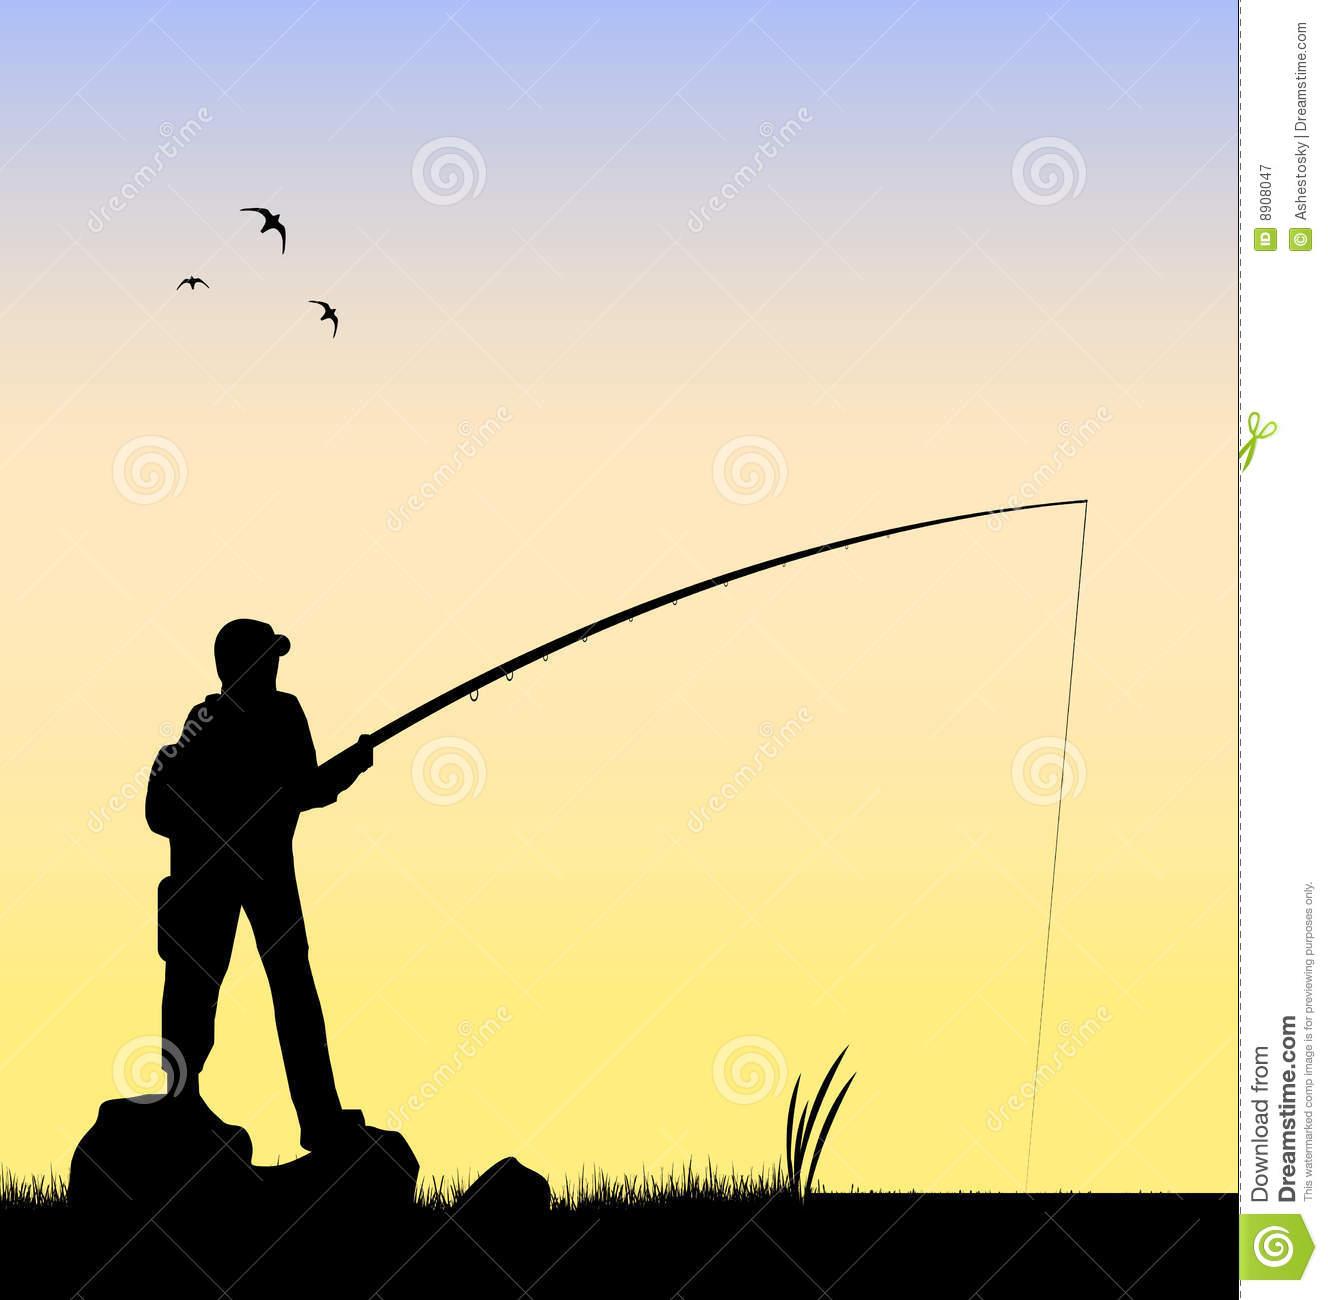 Download Get the best fishing svg images, download apps, download spk for windows,. Clipart Panda - Free Clipart Images 1svg.com